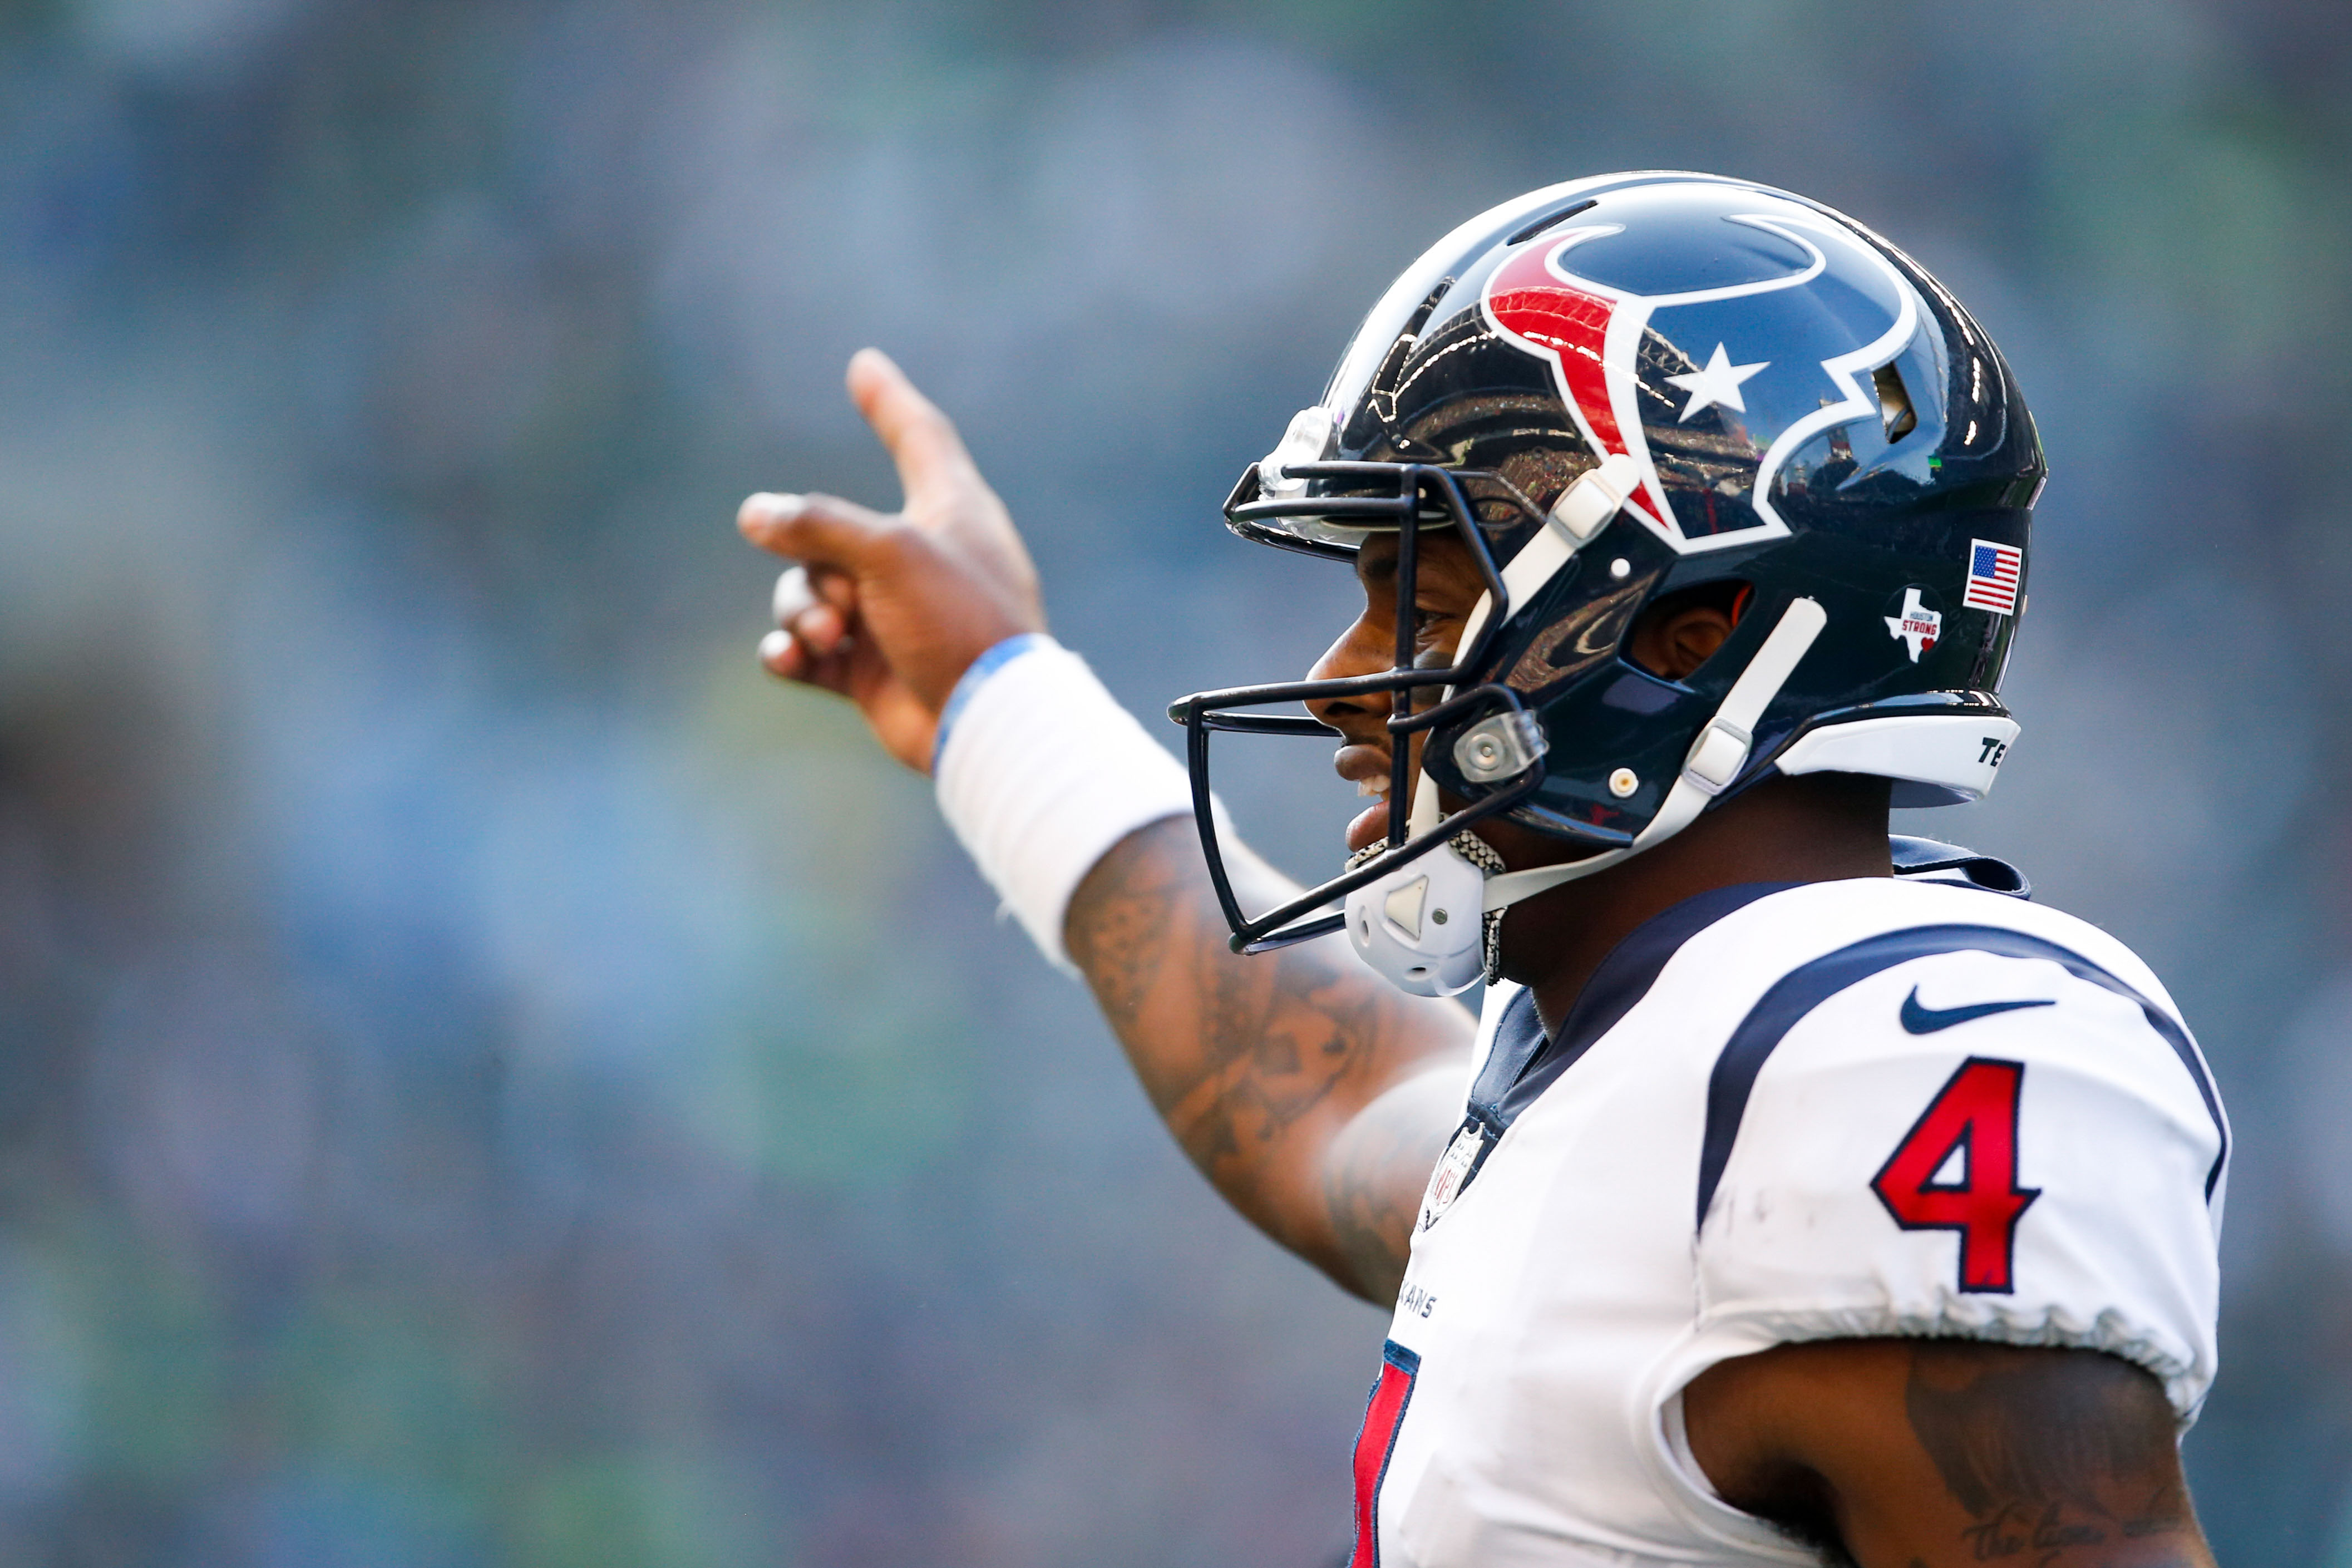 Fantasy football stats: Houston Texans best of the last decade